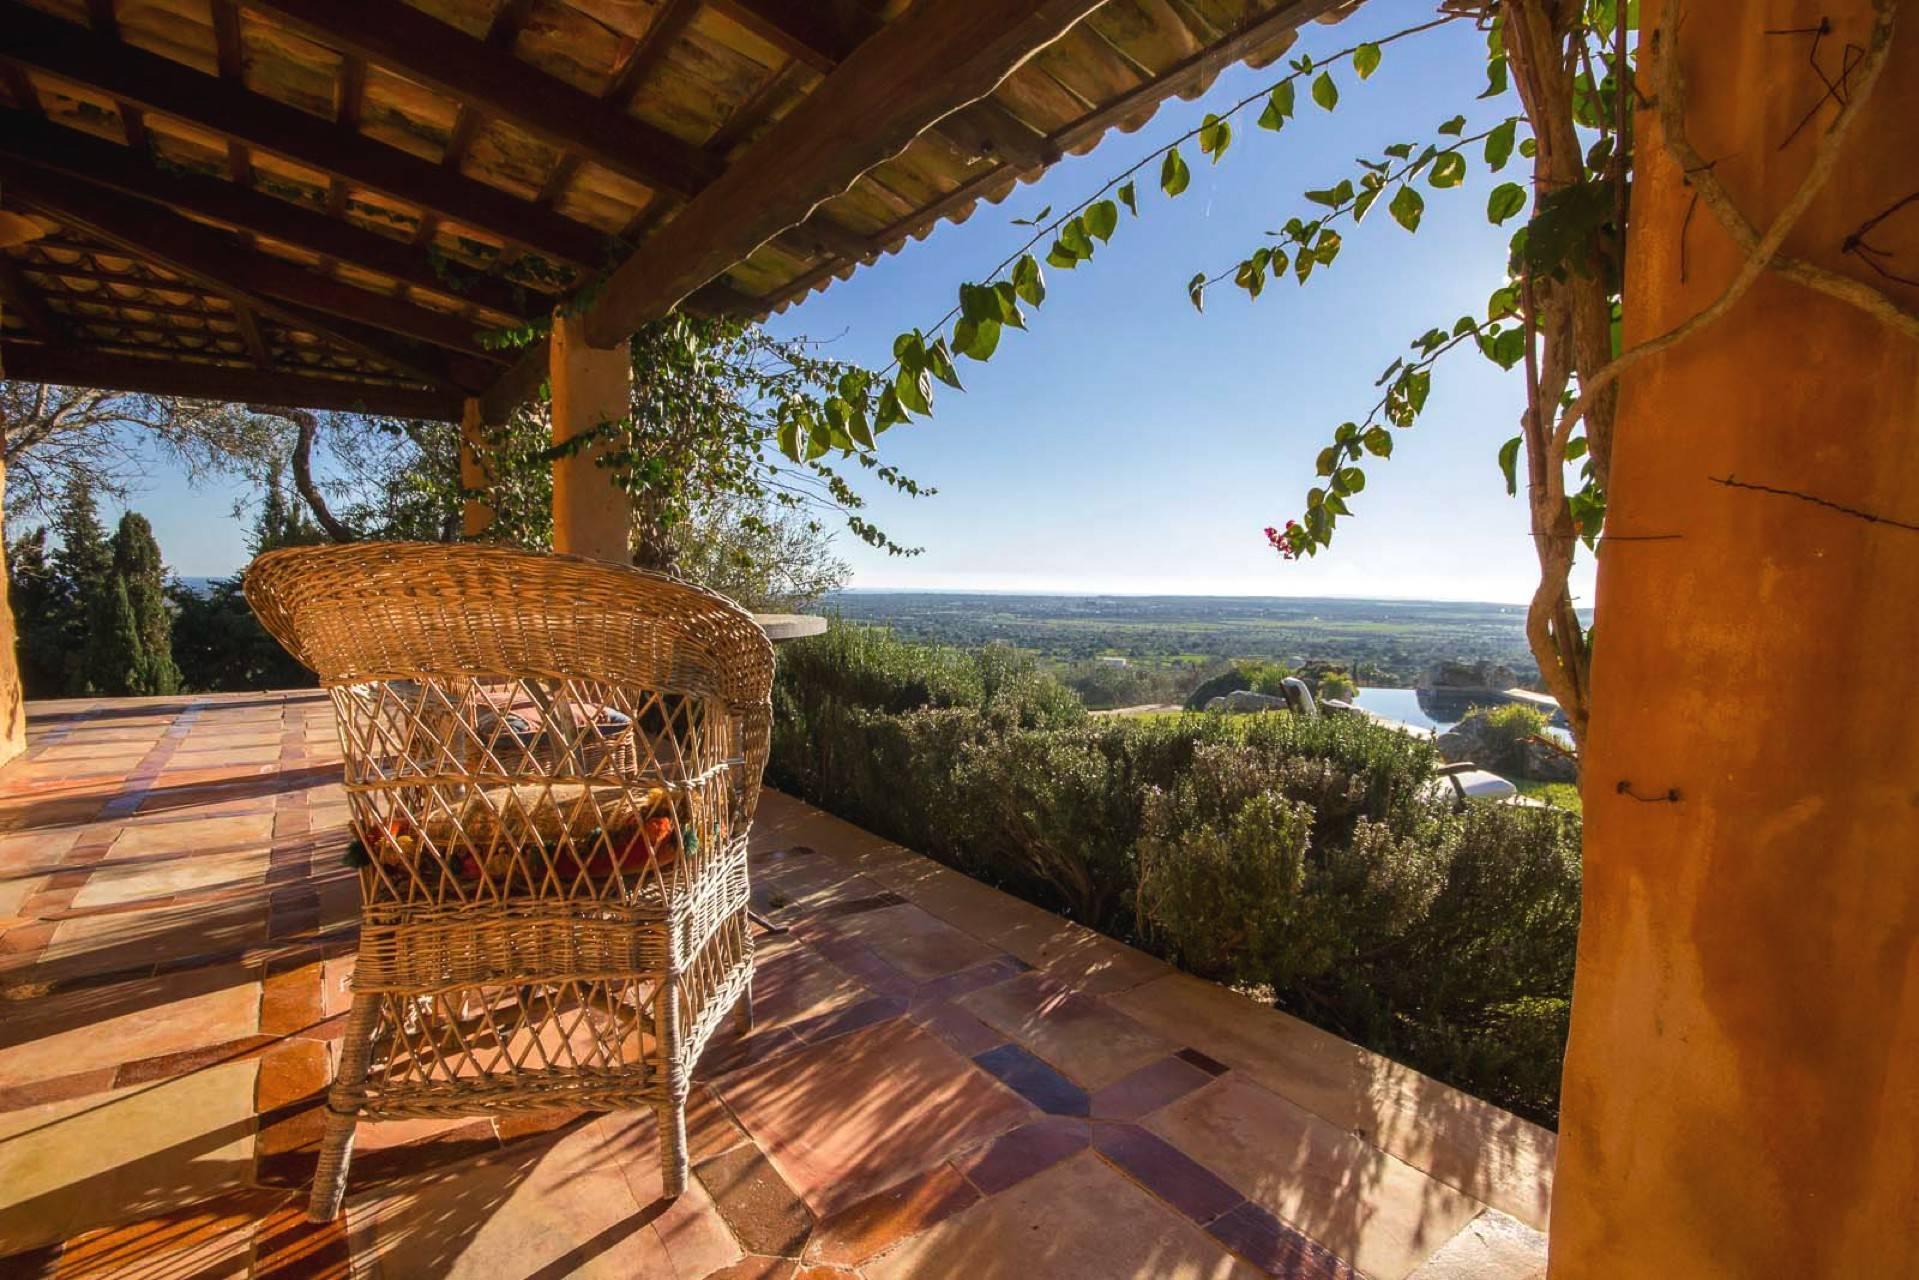 01-116 extravagante luxus Finca Mallorca Süden Bild 9